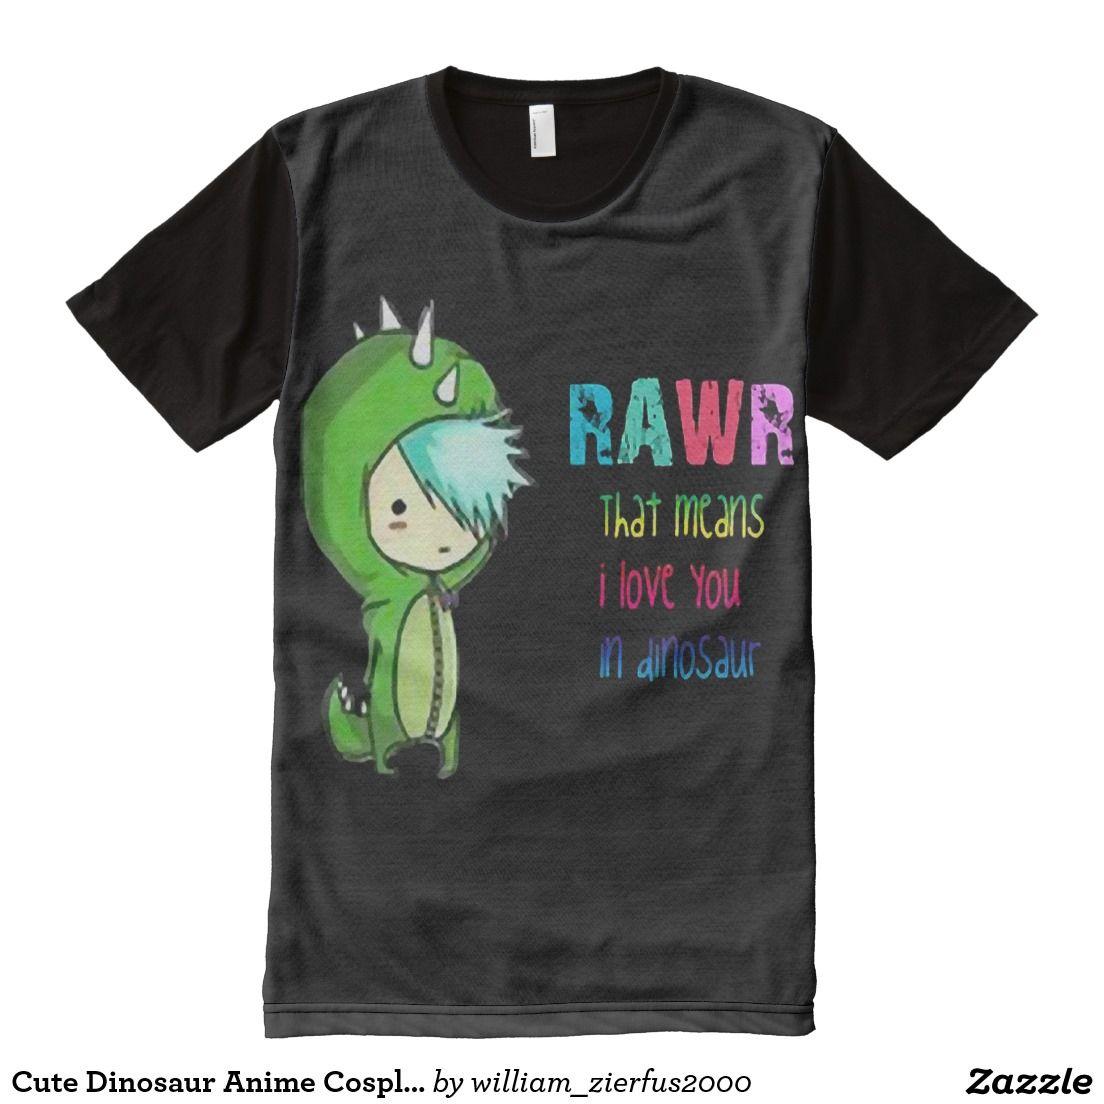 Cute dinosaur anime cosplay love alloverprint tshirt